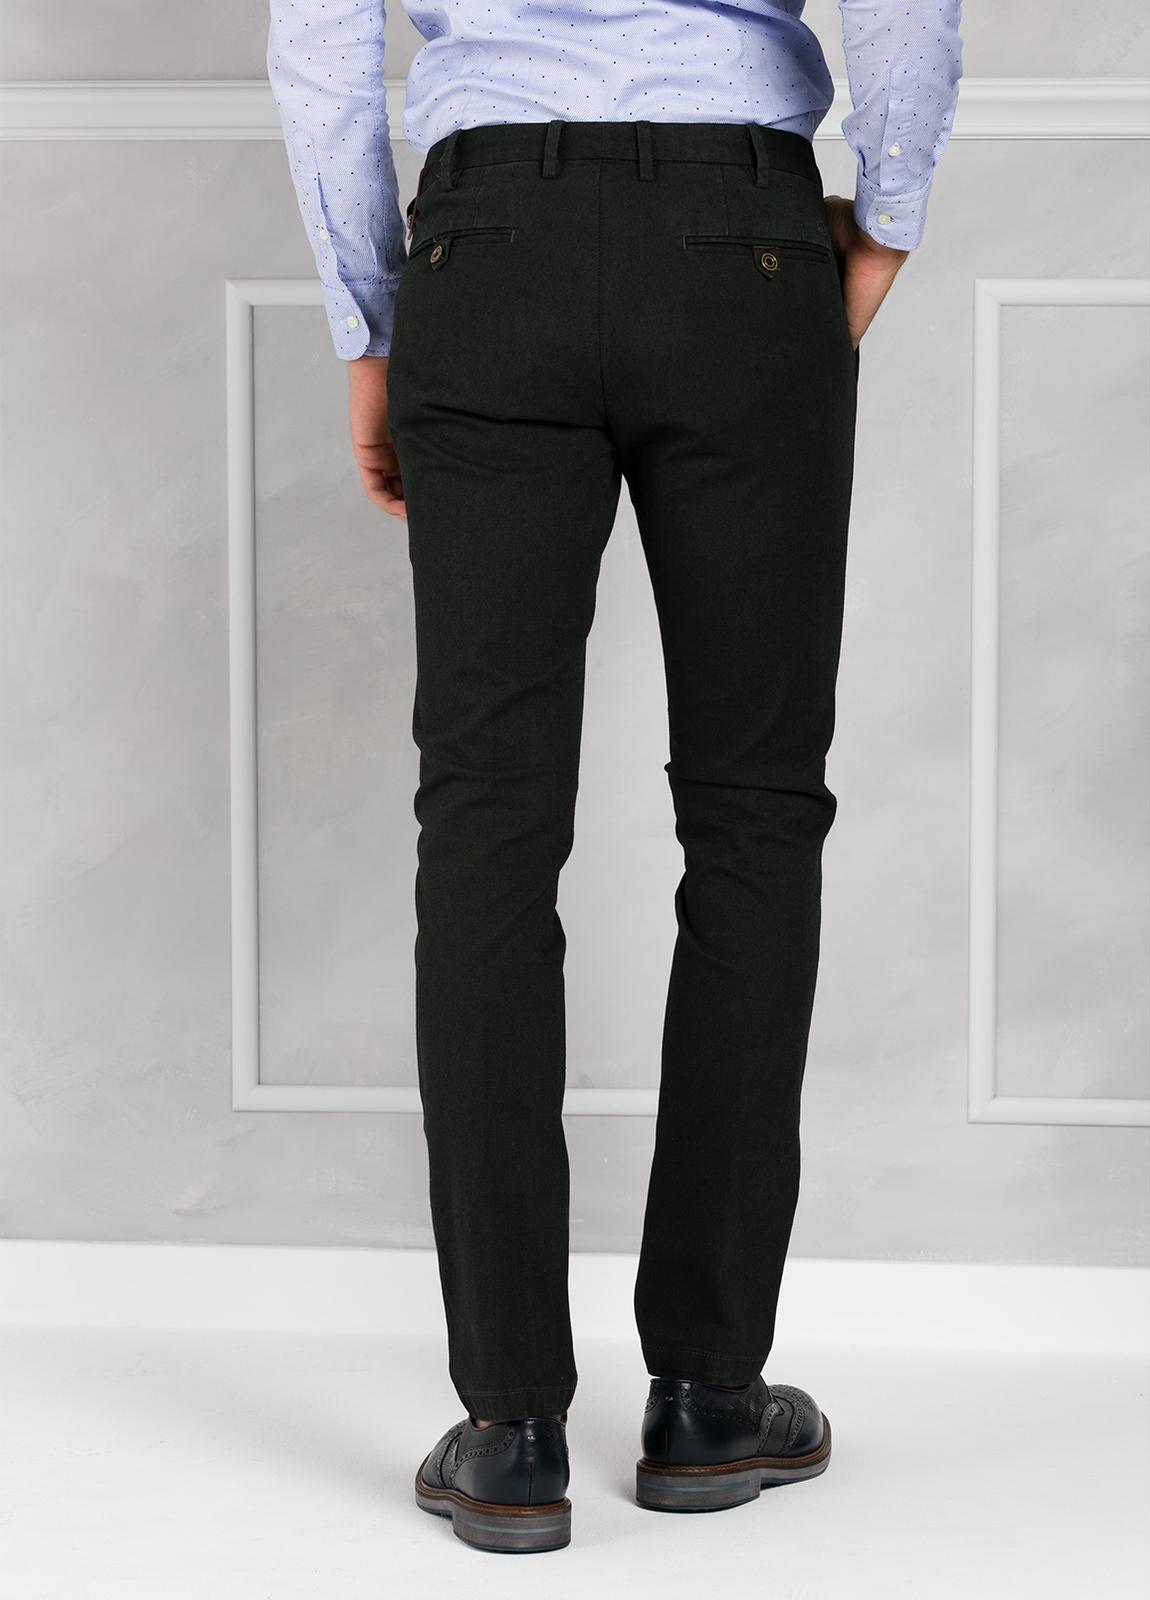 Pantalón chino ligeramente slim fit modelo JACK color verde. 98% Algodón 2% Elastán. - Ítem2